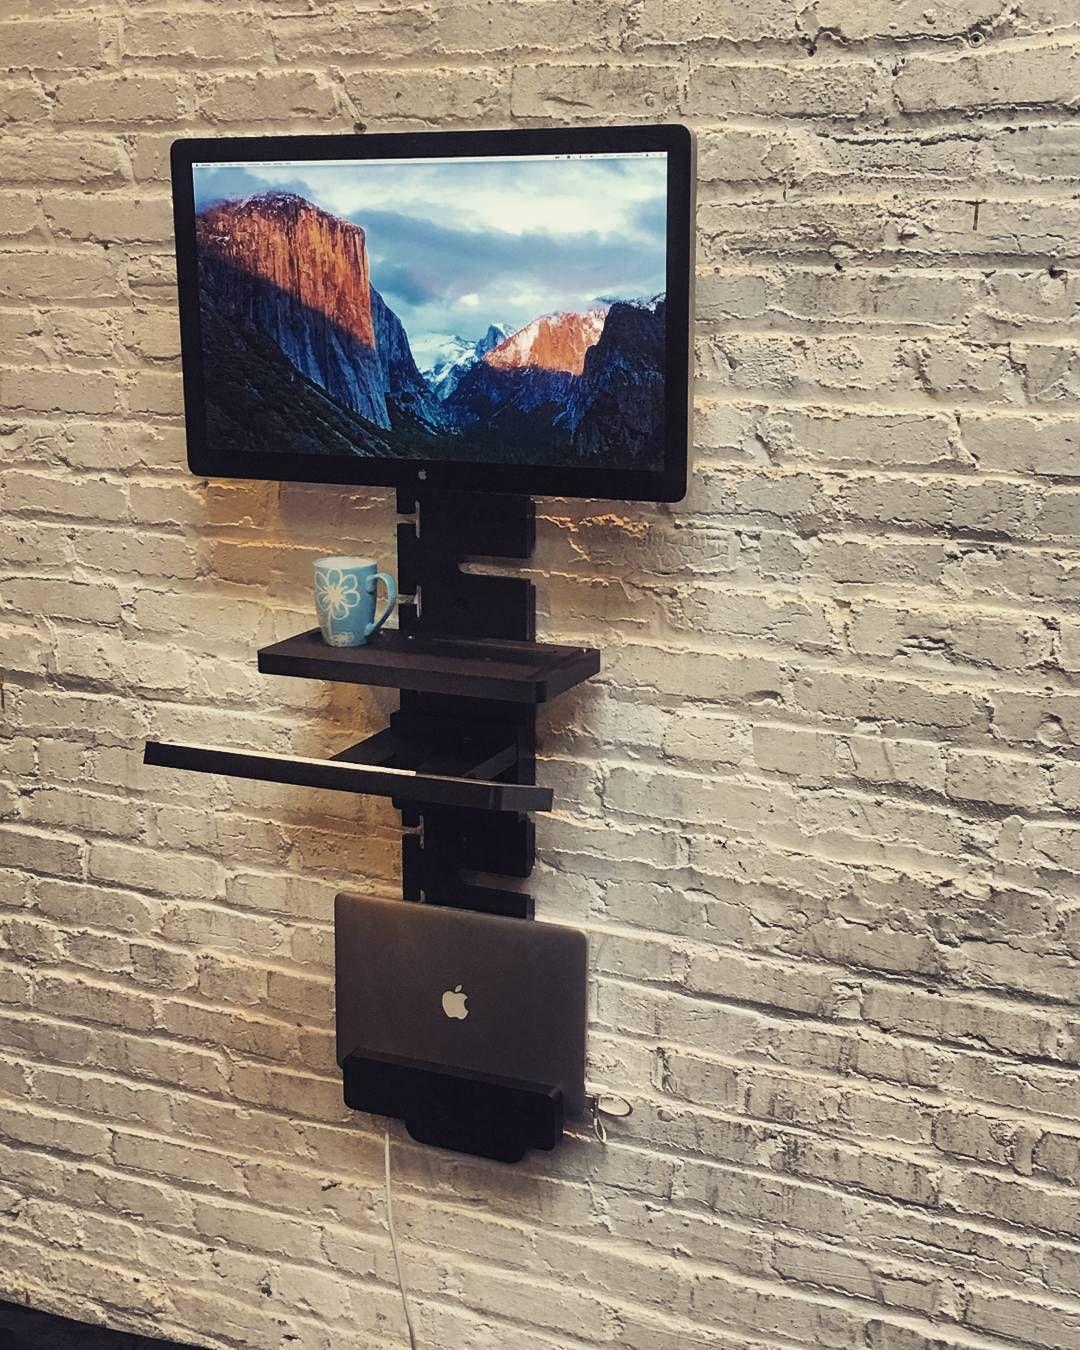 Standcrafted #hpde #standingdesk #kickstarter #moderndesign #minimalist #standcrafted